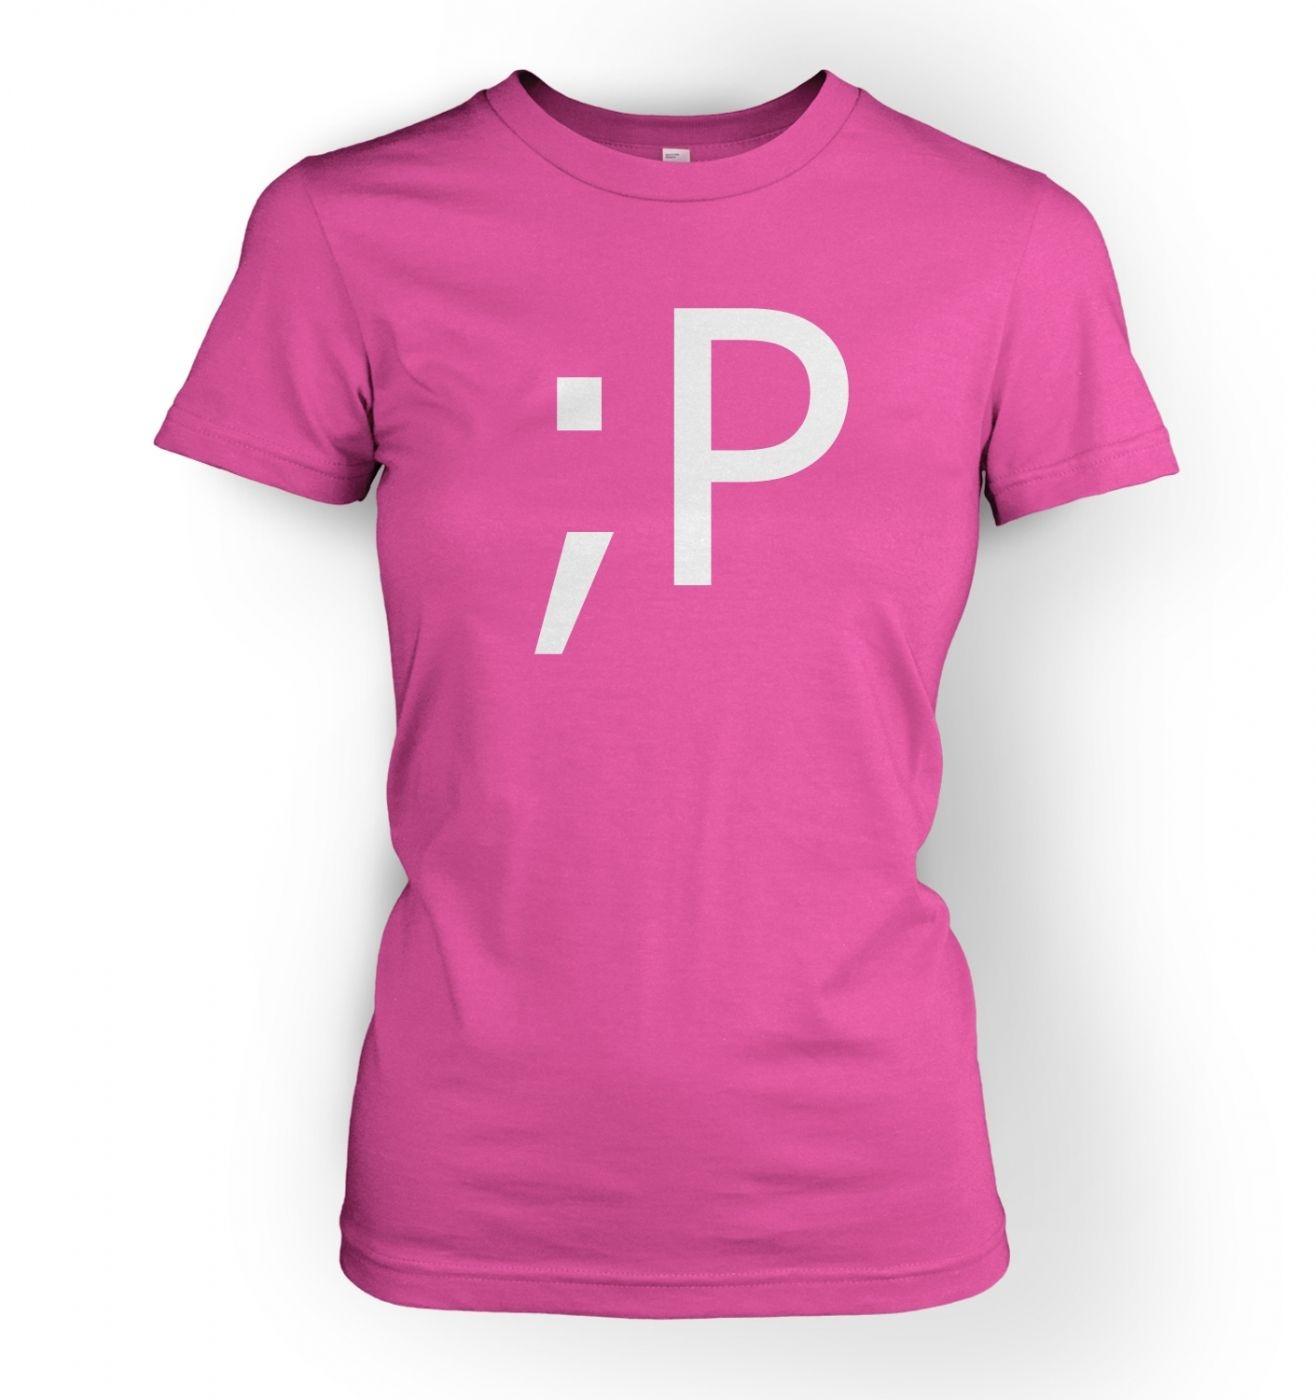 Women's Winking Tongue Emoticon t-shirt